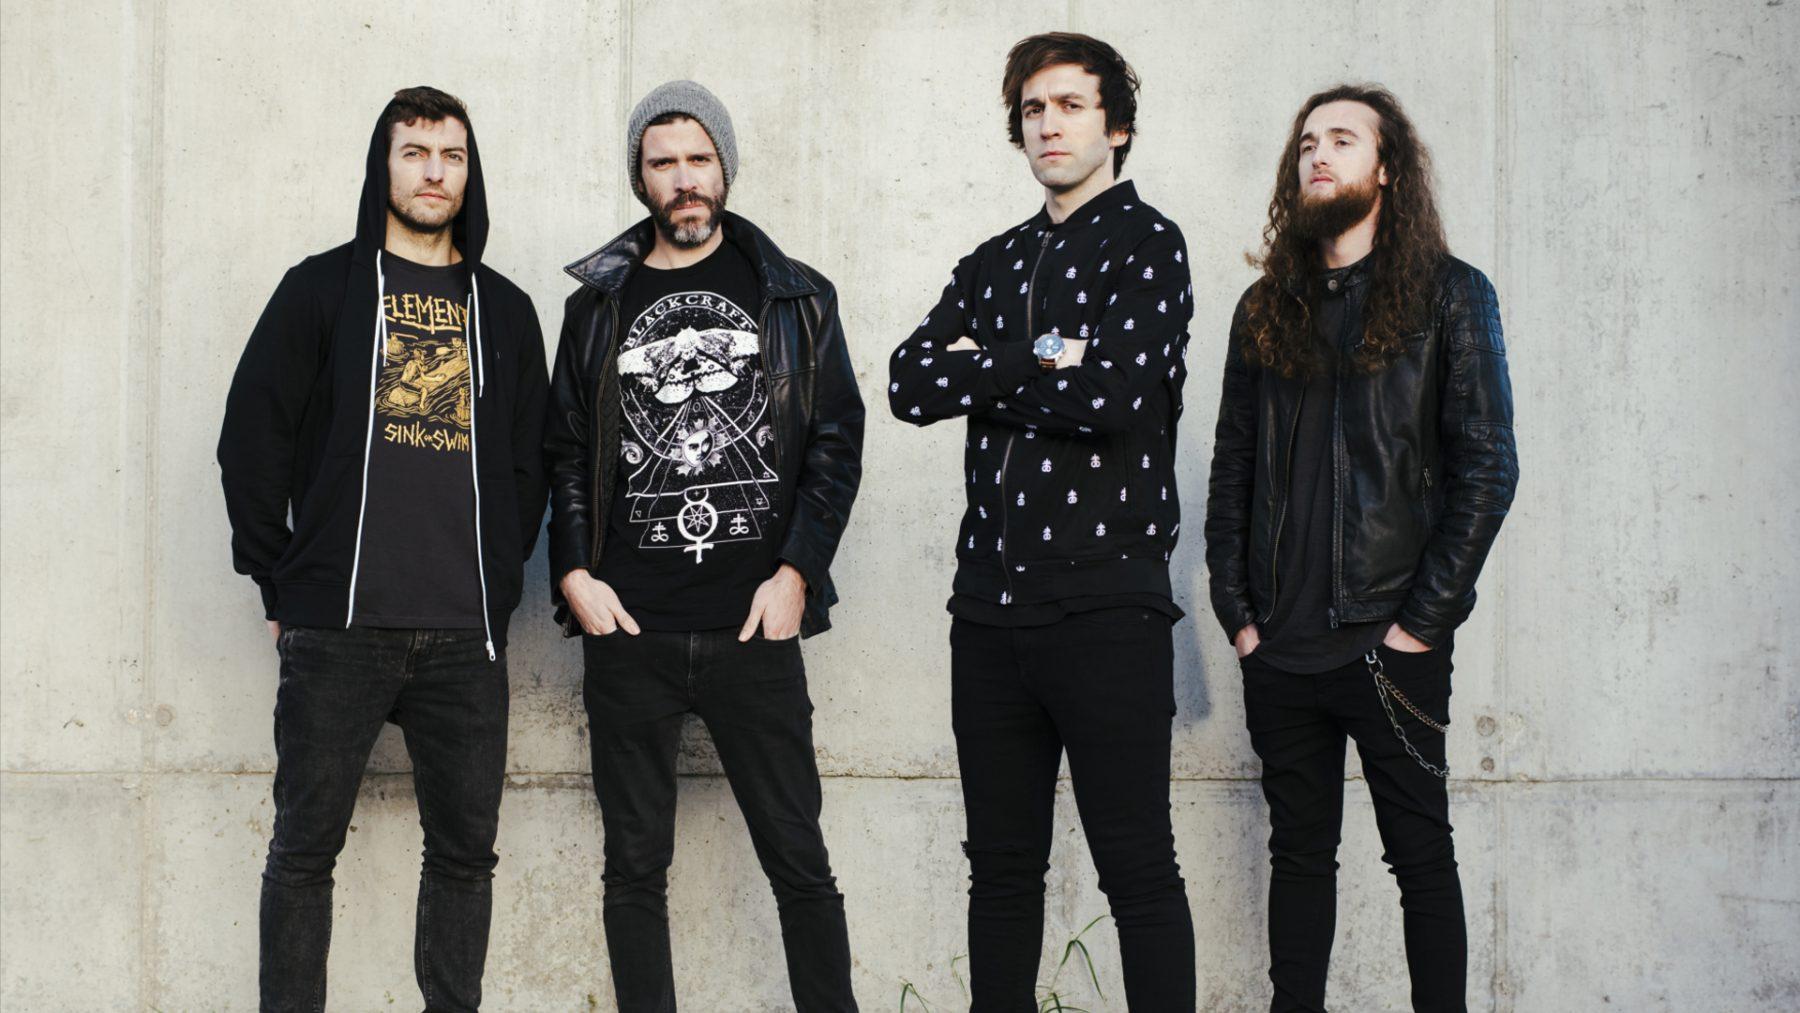 ntbf band - the boys